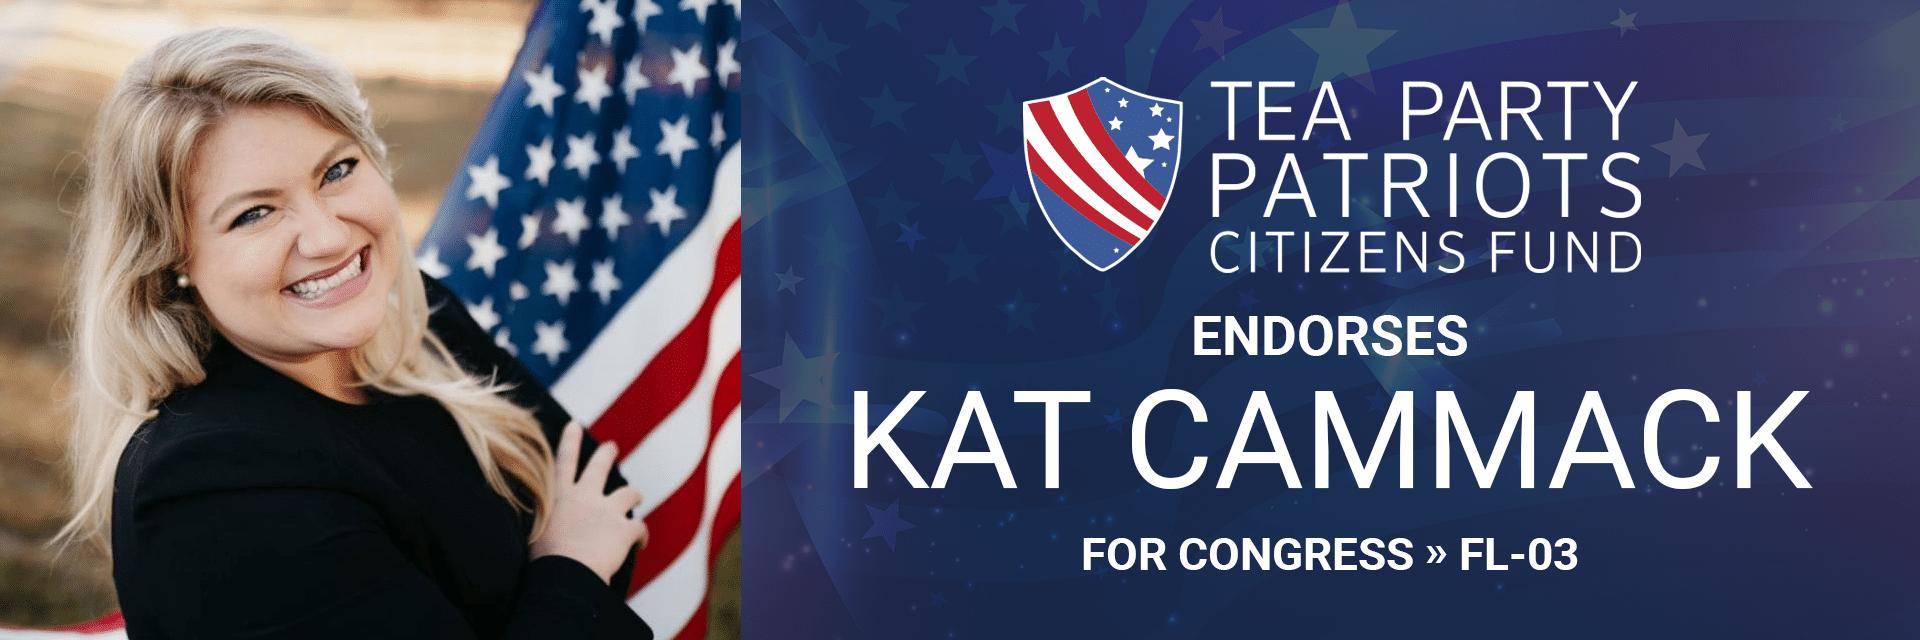 TPP_banner_2020Endorsement-KatCammack